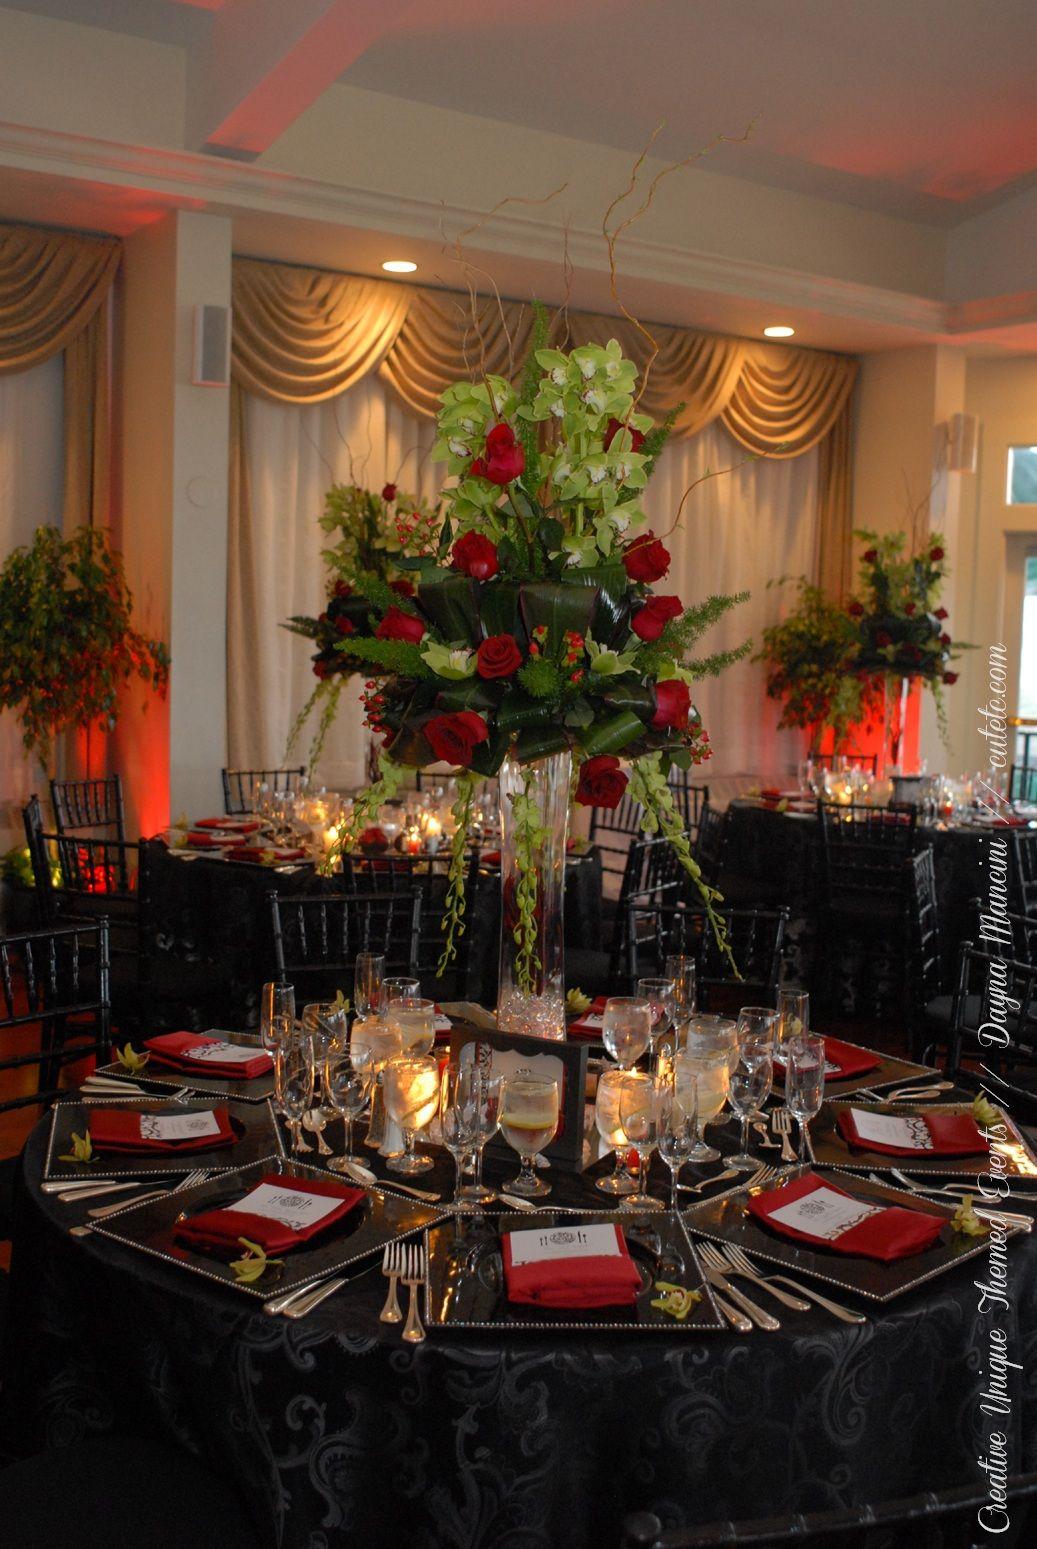 #wedding #blackandred #oceancliff #newport dayna mancini // event design and coordination // cutetc.com